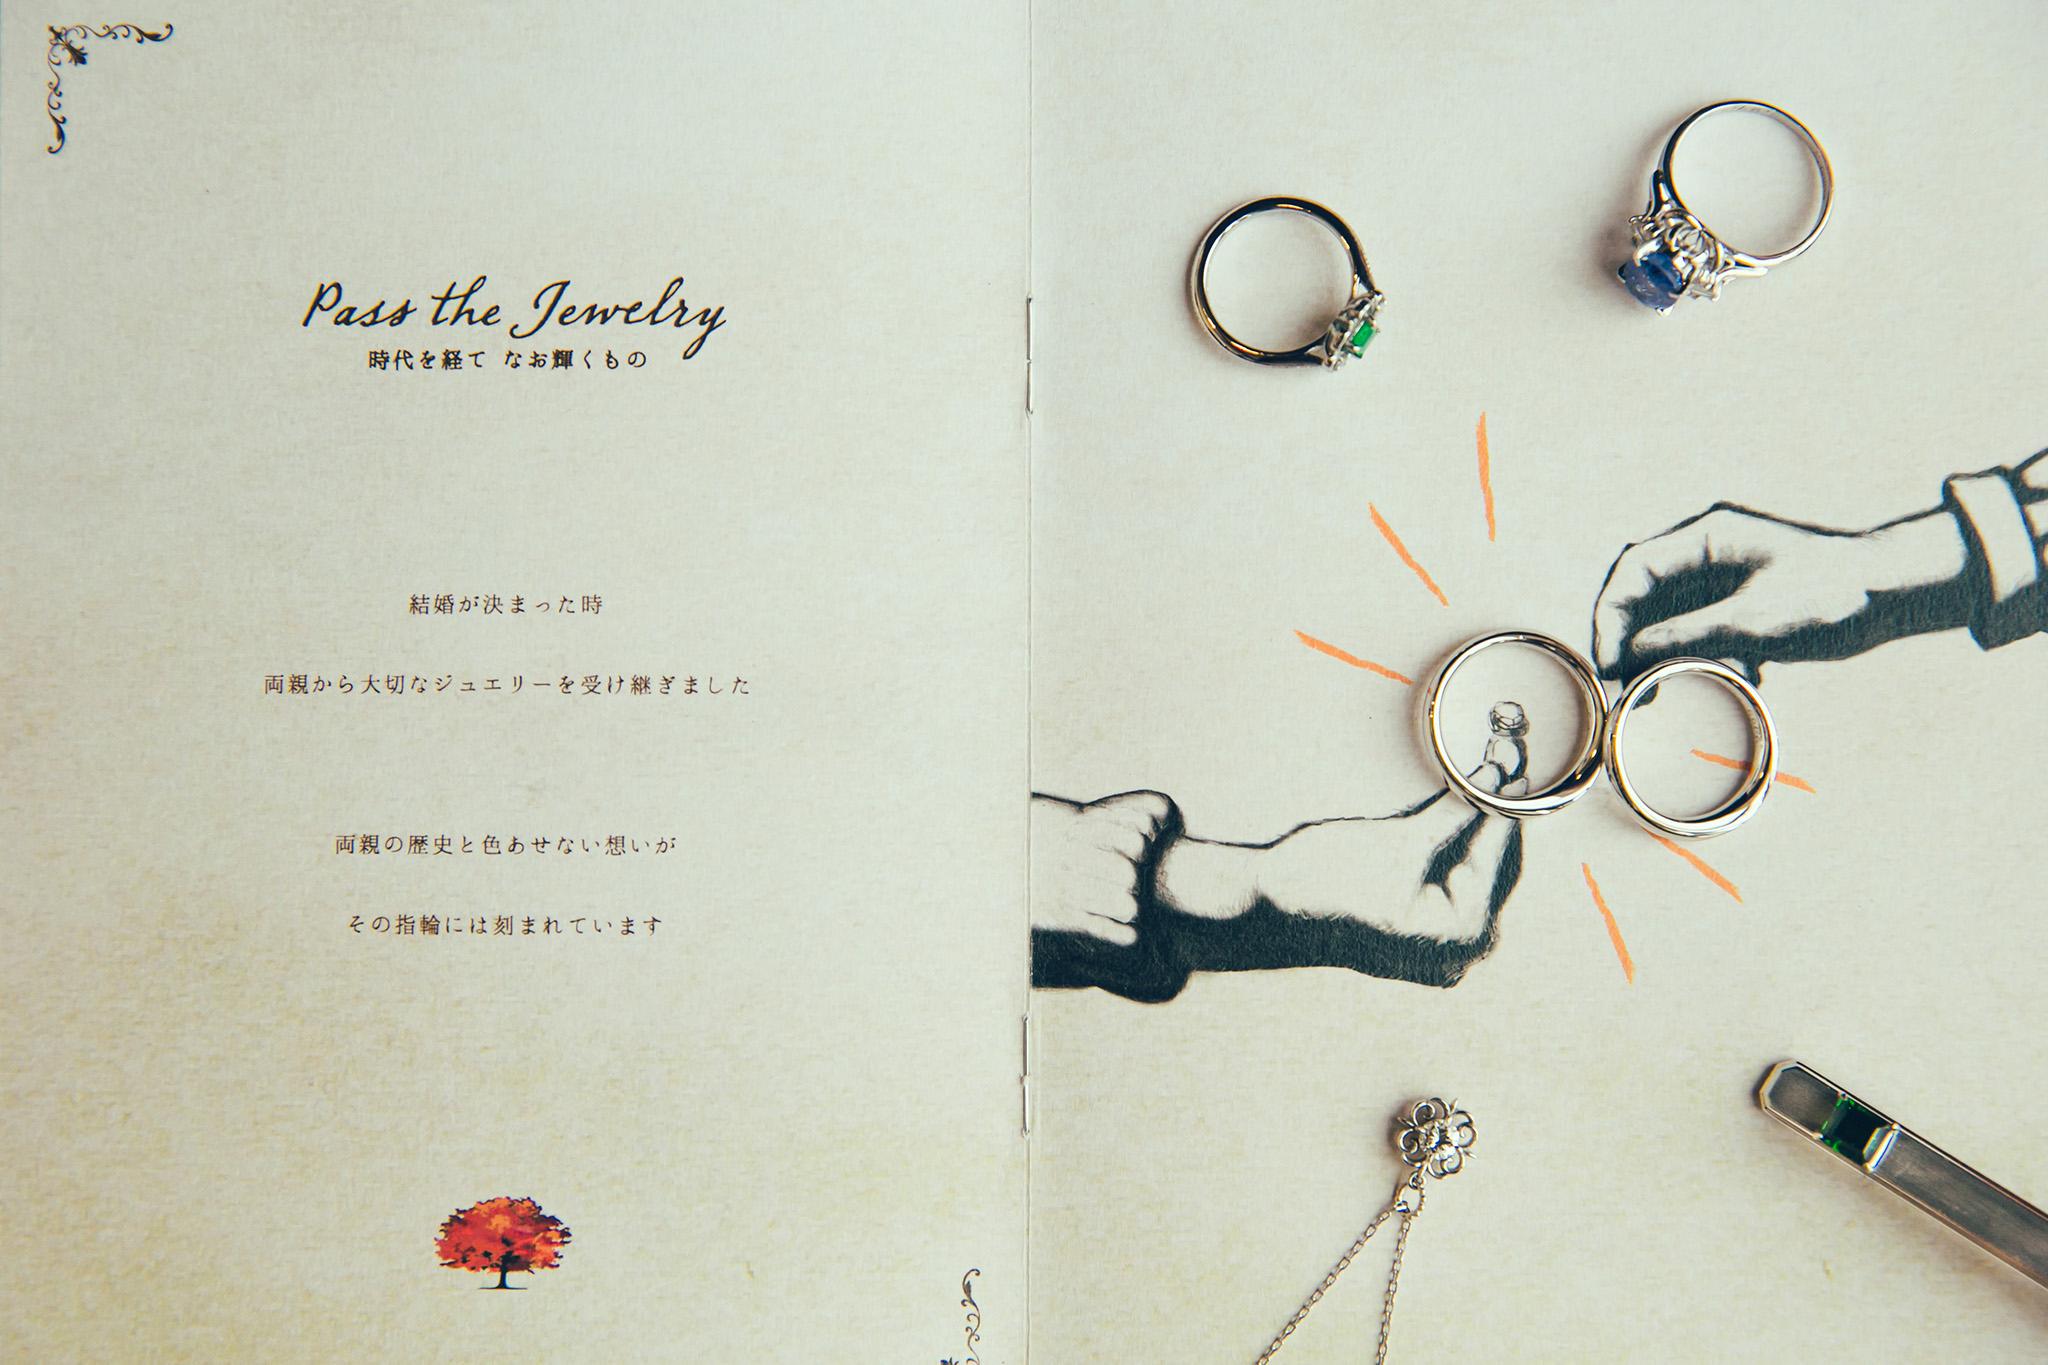 """Pass the baton""というコンセプトの結婚式では、両親や祖父母から受け継いだジュエリーを、参列者用の冊子の中で見つけた""Pass the Jewelry""というページ上に配し、二人だけのオリジナルな一枚を演出した。"